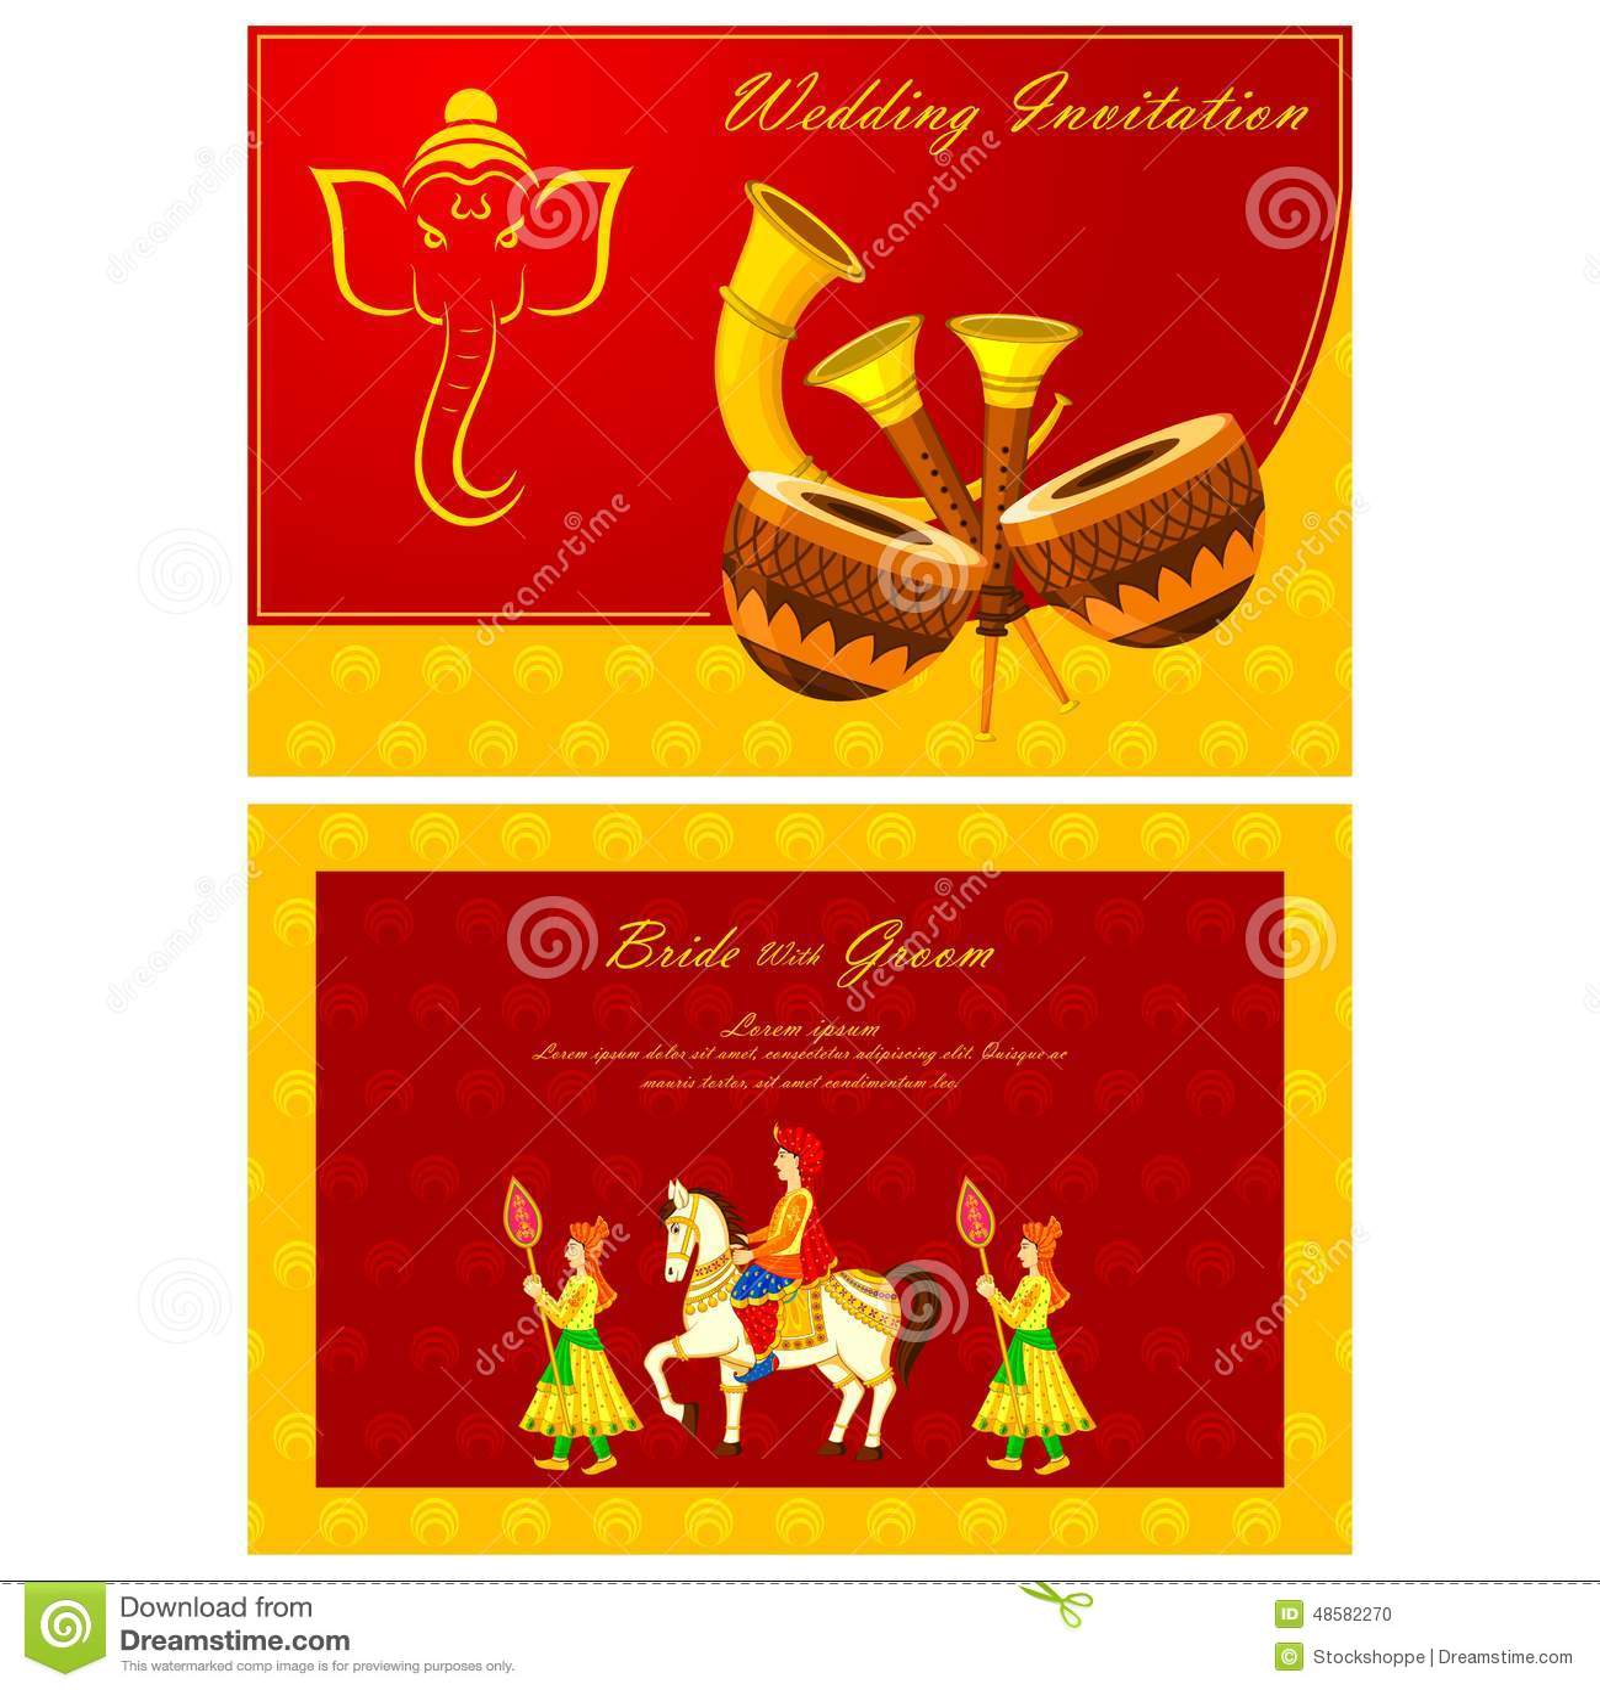 stock illustration indian wedding invitation card vector illustration image indian wedding invitation Indian wedding invitation card